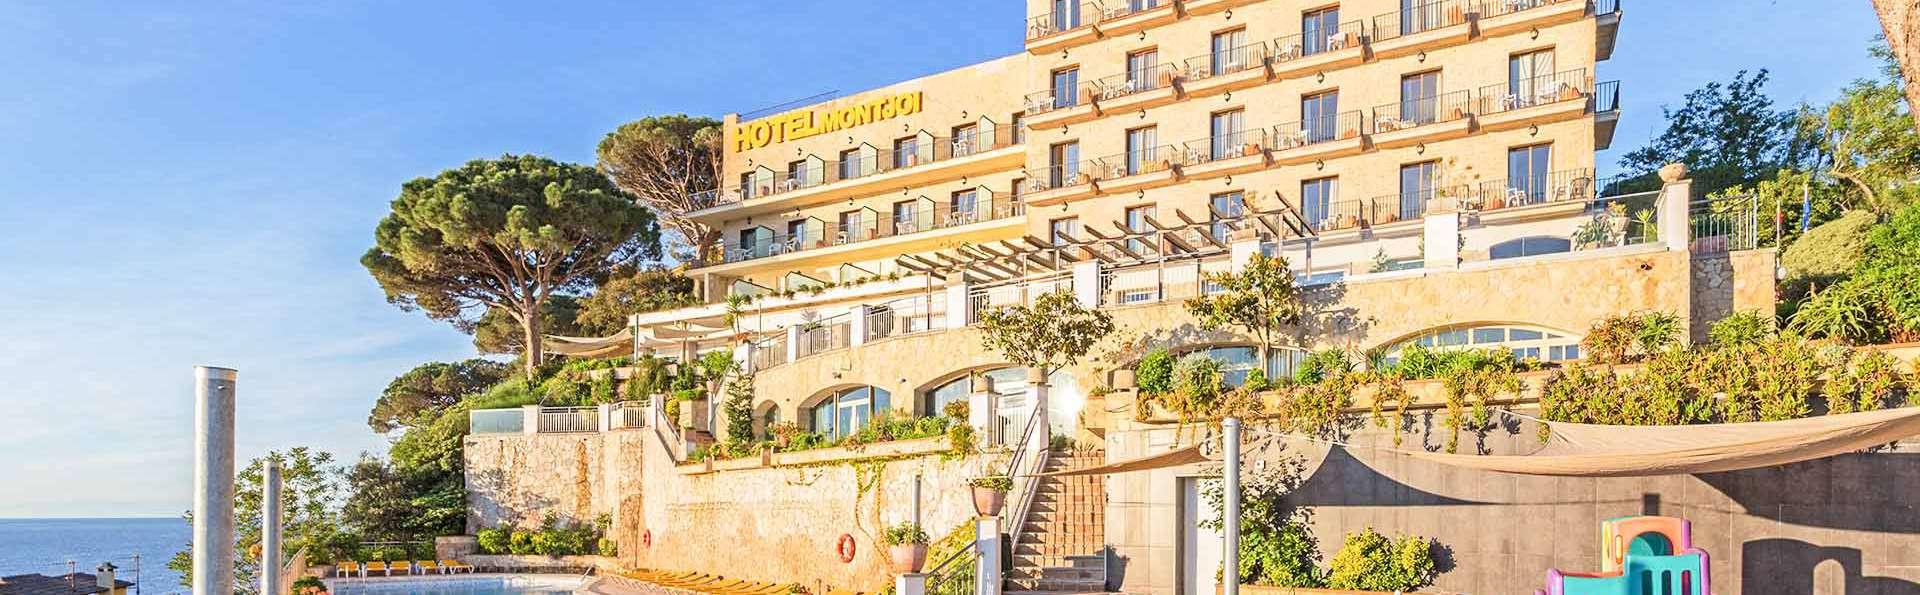 Hotel Montjoi - EDIT_EXTERIOR_03.jpg